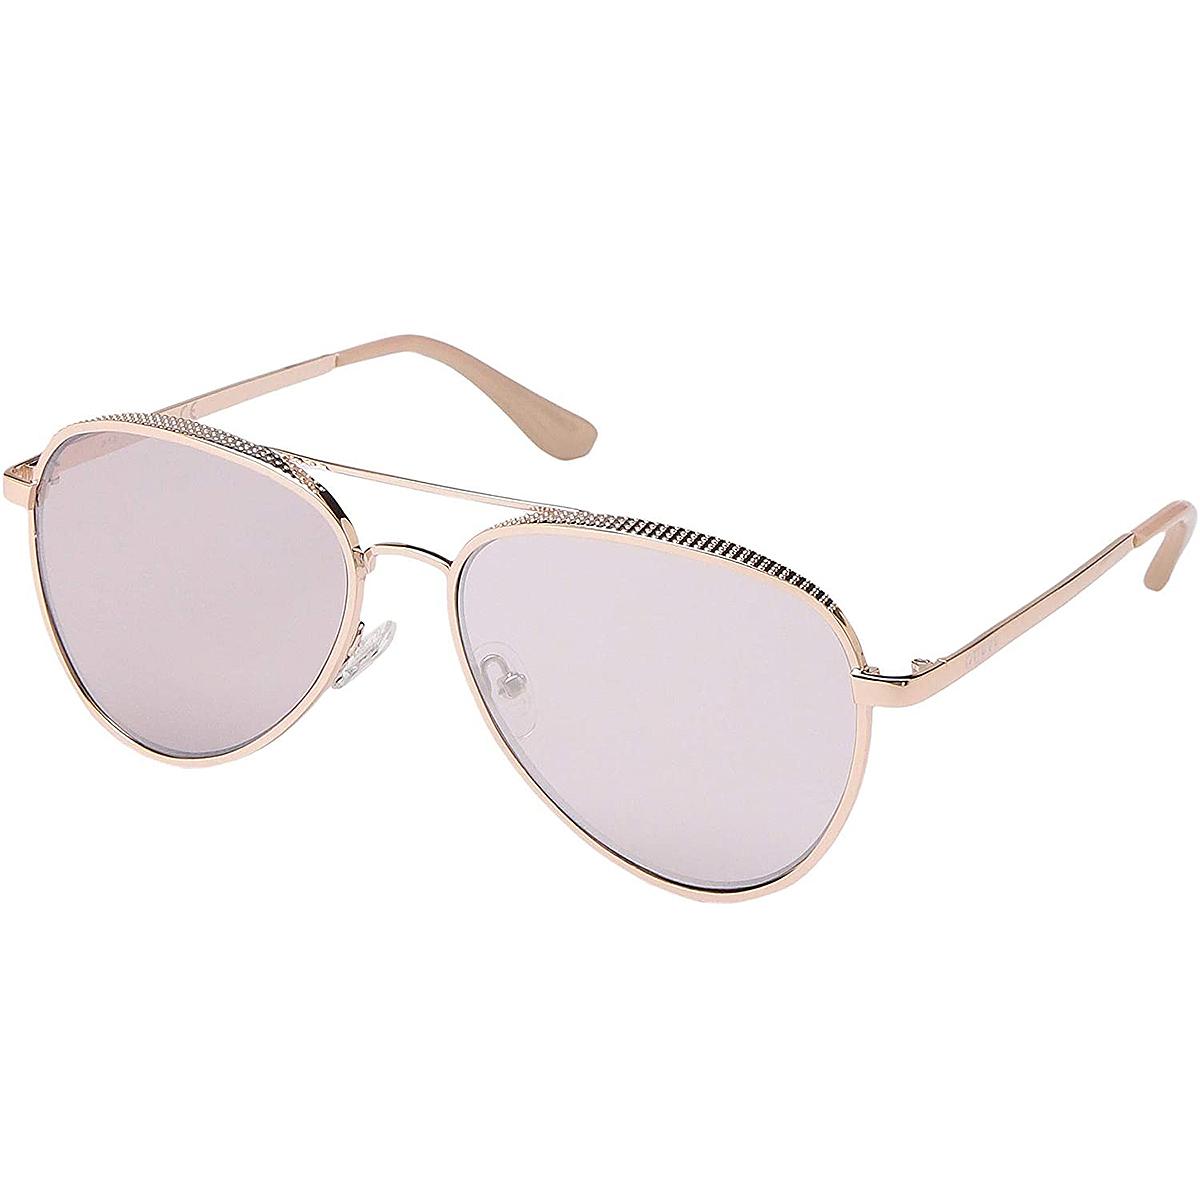 aviator-sunglasses-guess-oval-face